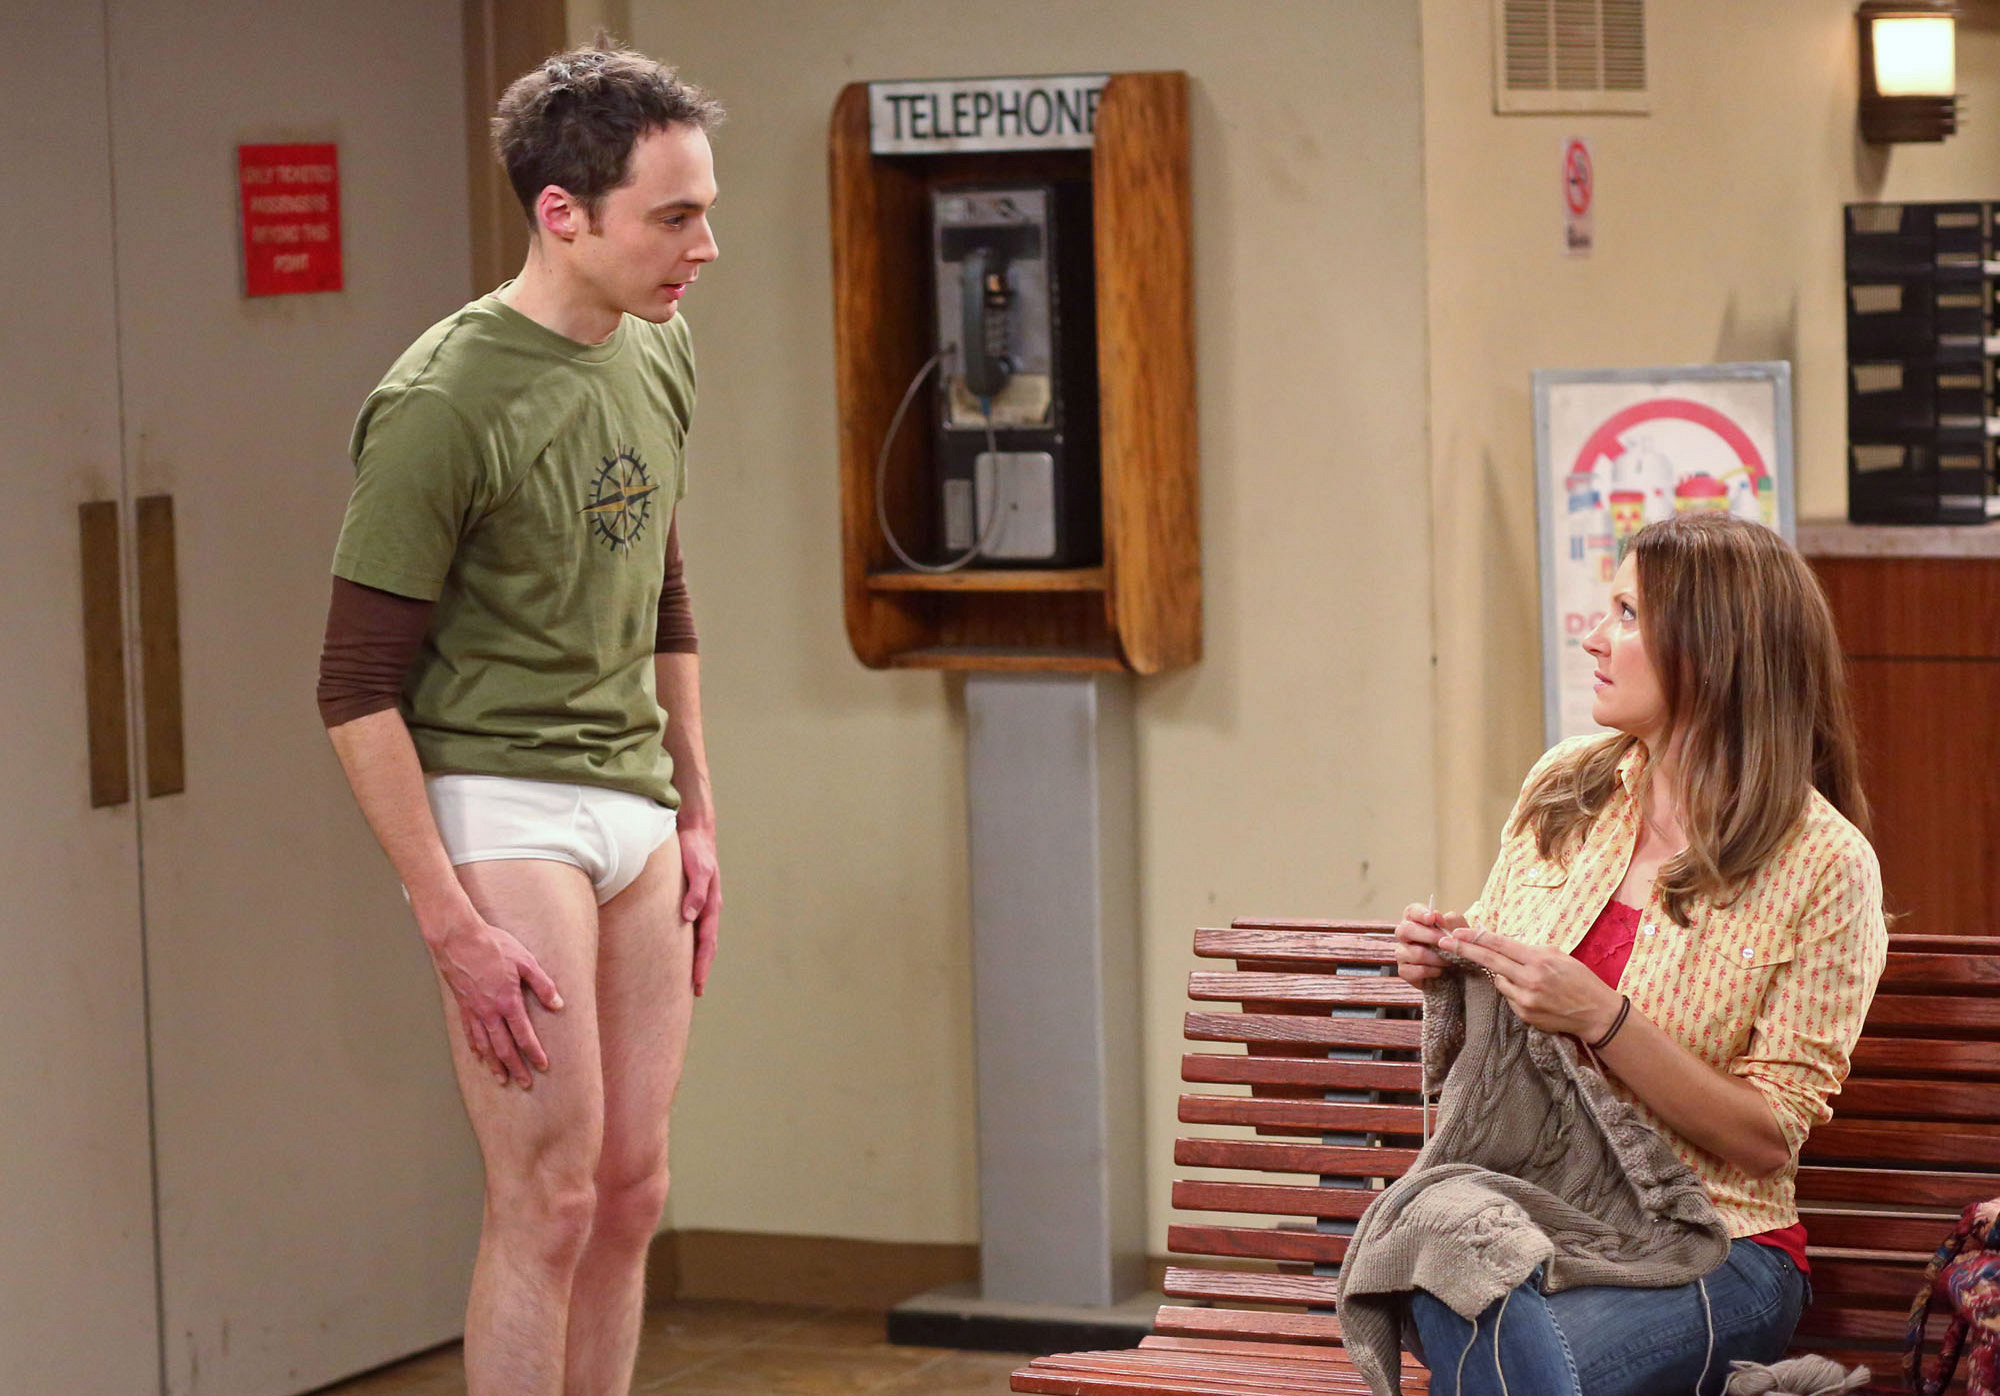 Sheldon in his underwear